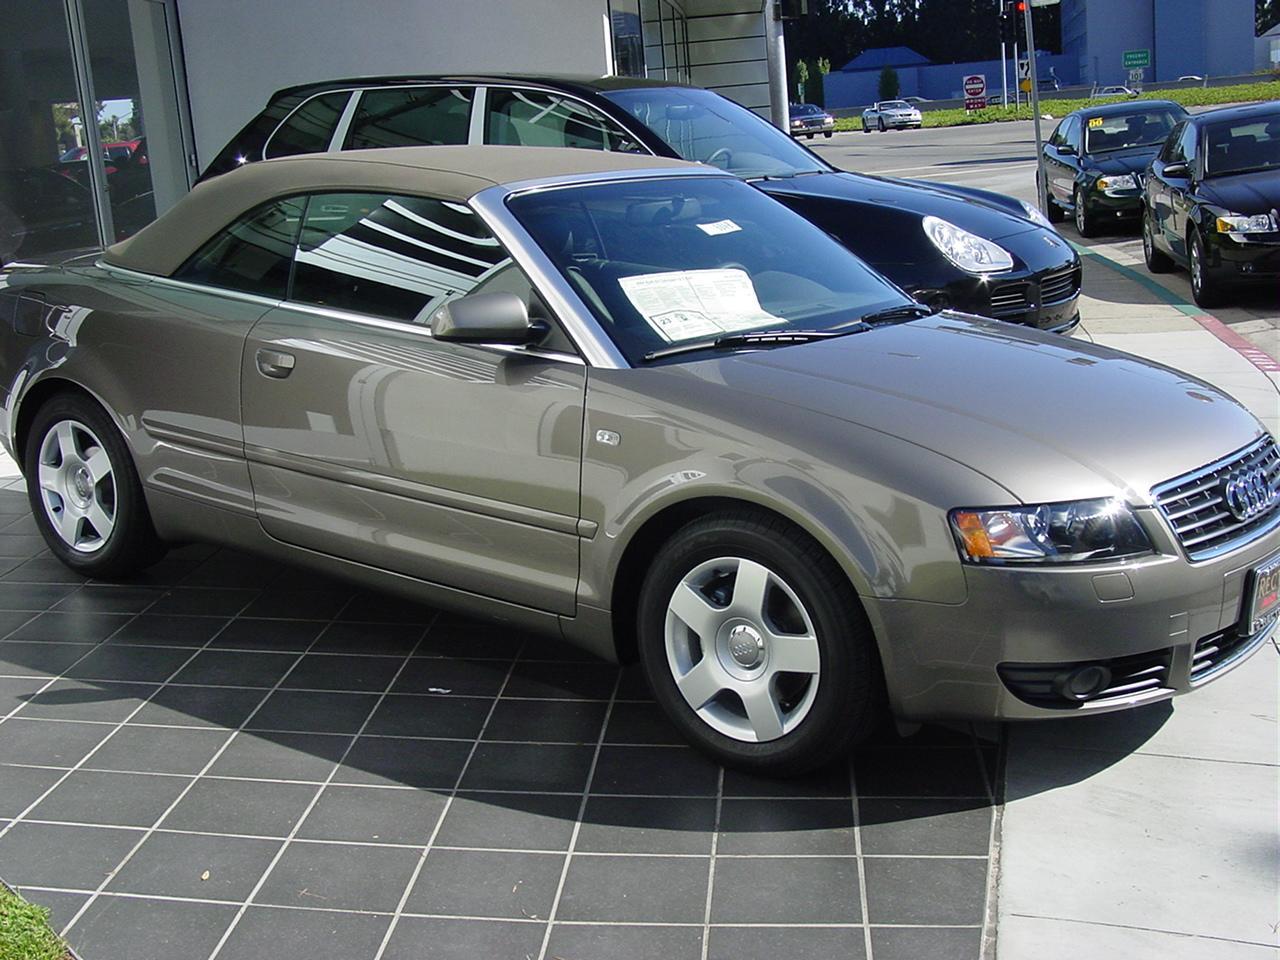 Audi Club Dealer Day At Rector Audi Burlingame Ca